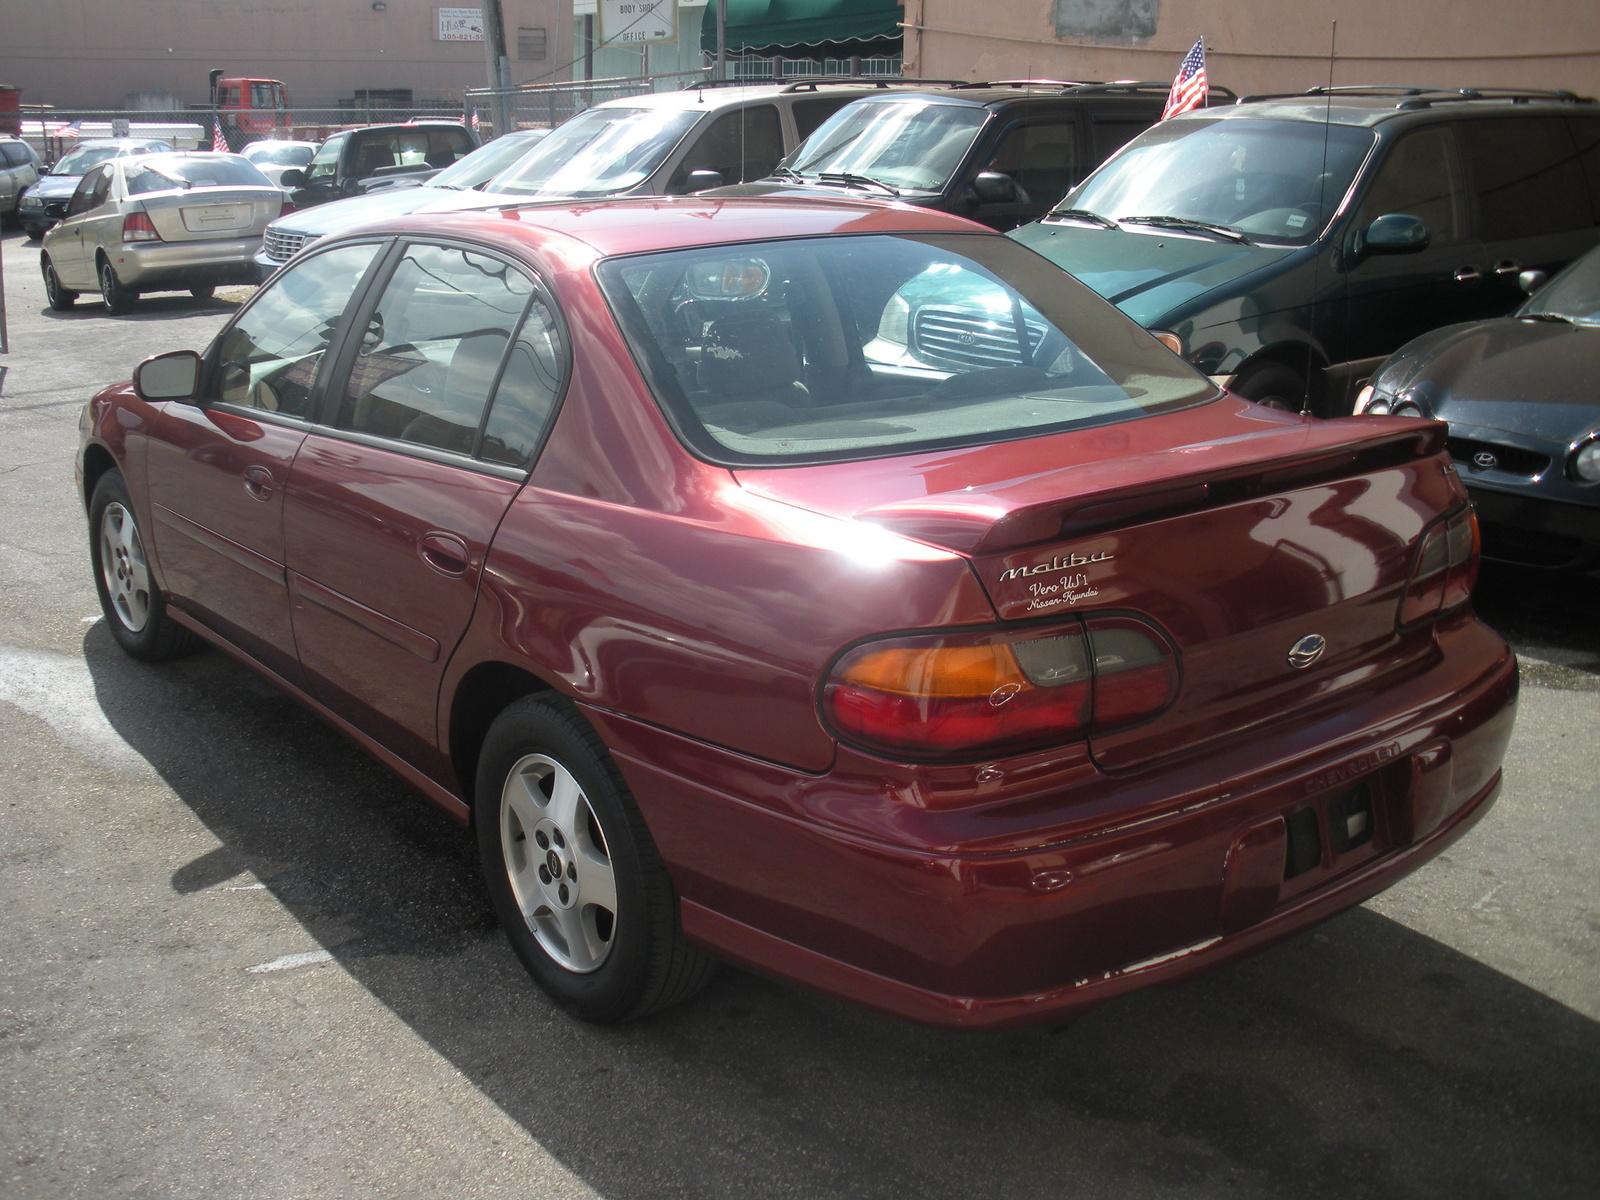 2003 Chevrolet Malibu - Pictures